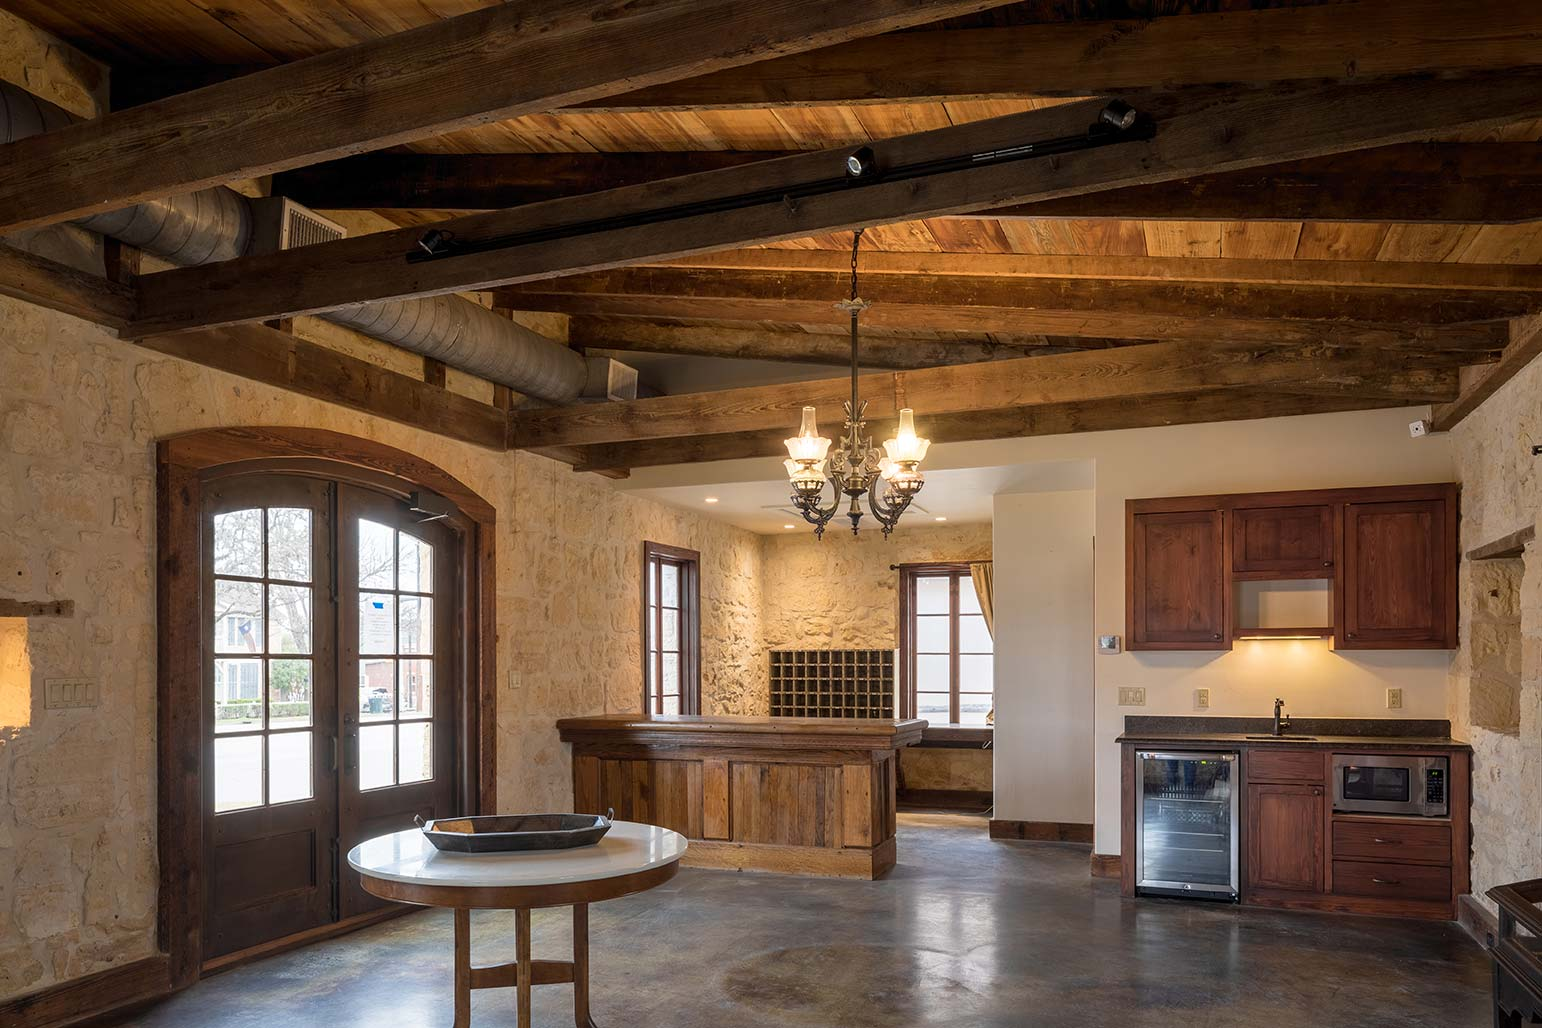 blacksmith-quarters-fredericksburg-realty-texas-commercial-real-estate-for-sale-limestone-historic-town.jpg